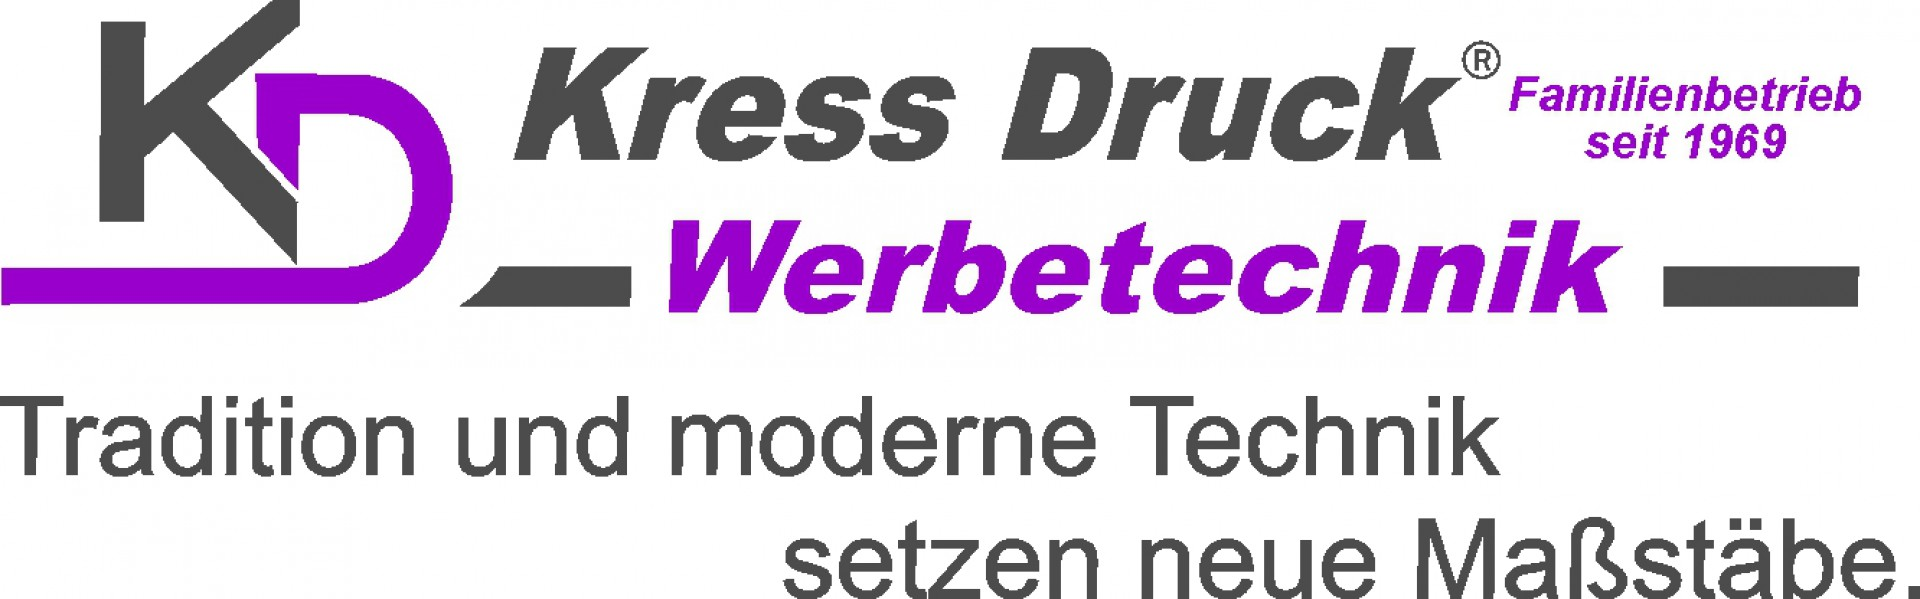 Kress Druck & Werbetechnik Bergrheinfeld